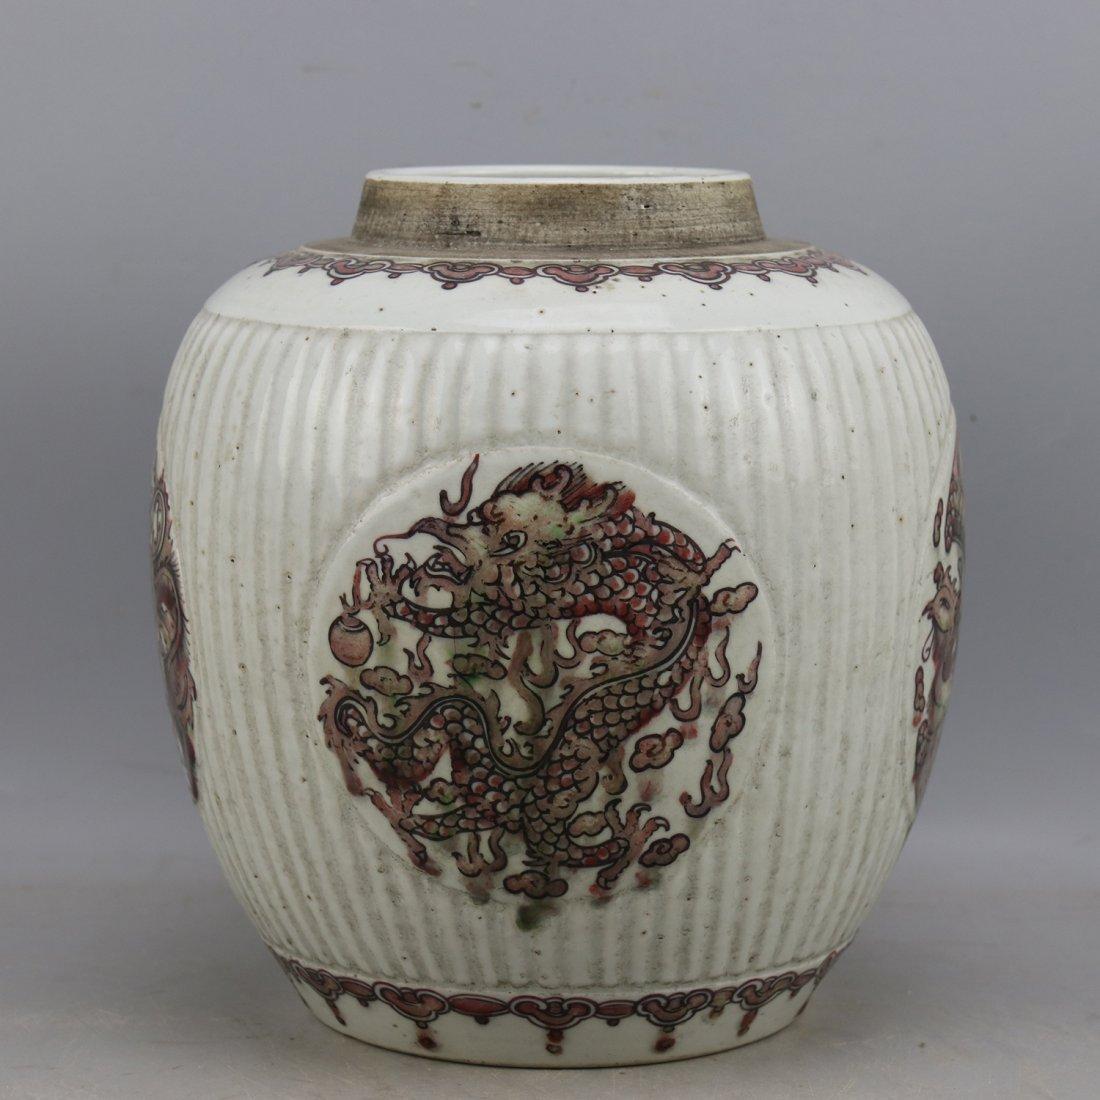 Chinese Underglaze red Porcelain Jar